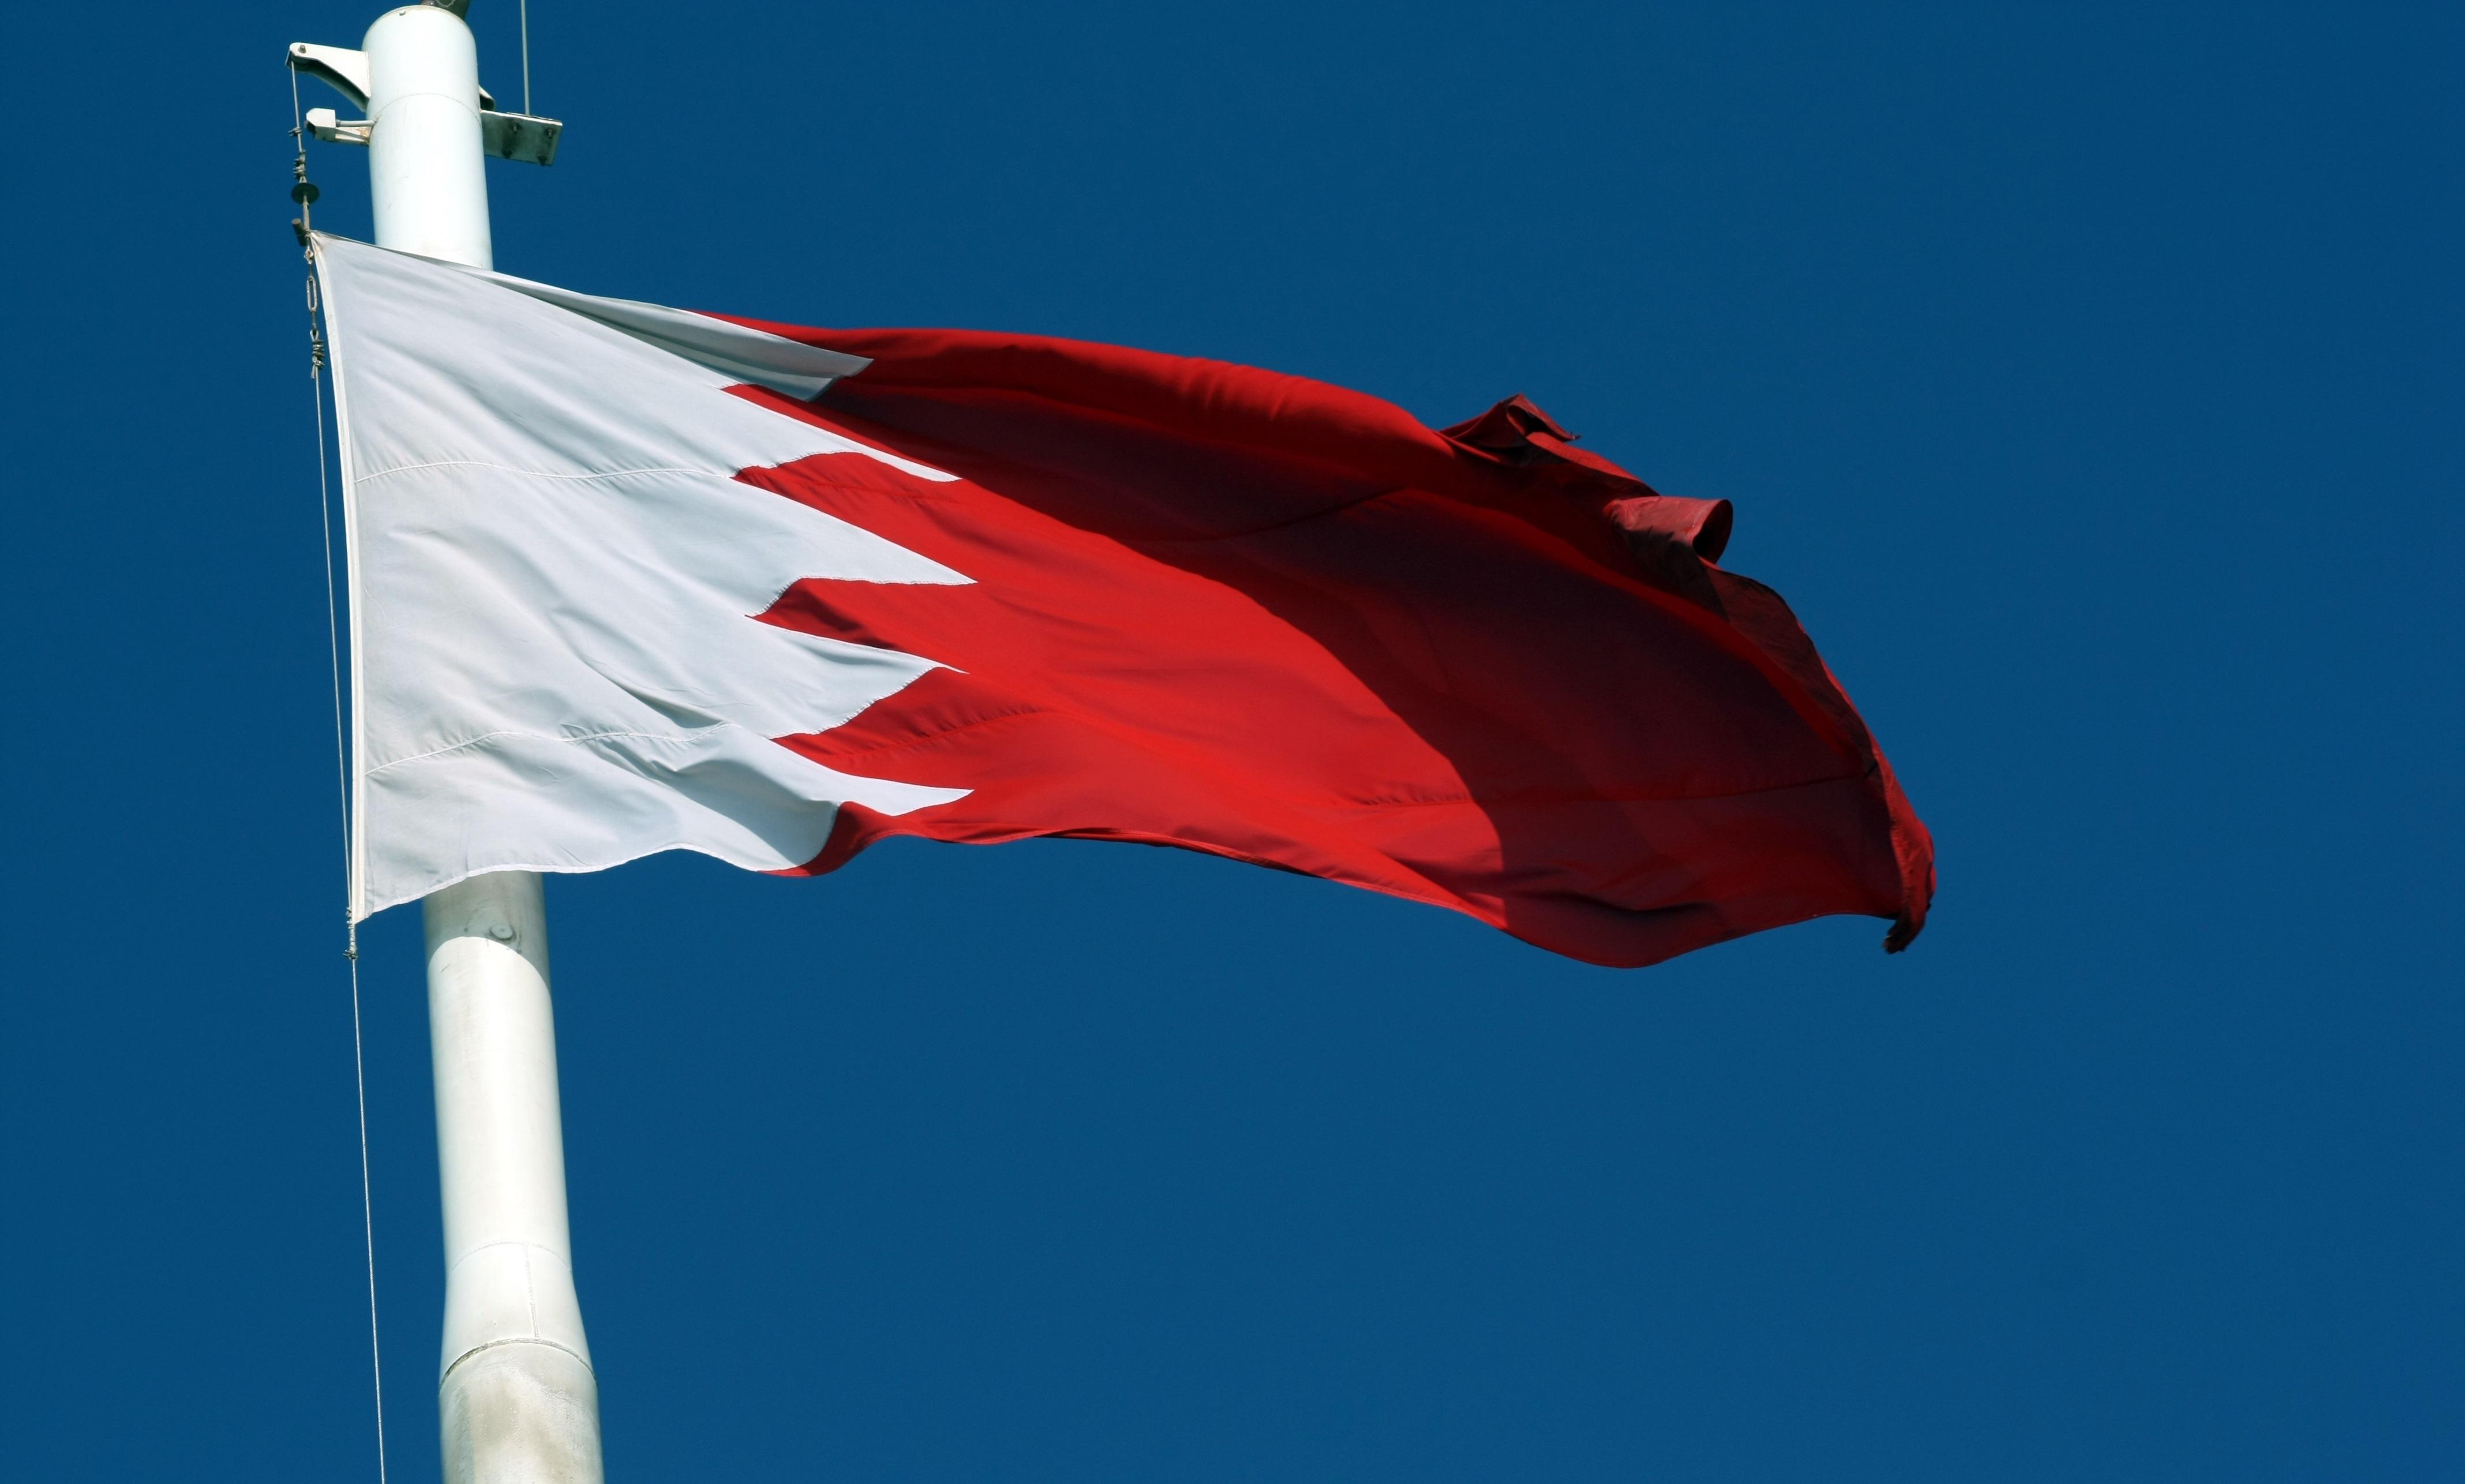 FileFlag Of Bahrainjpg Wikimedia Commons - Bahrain flags